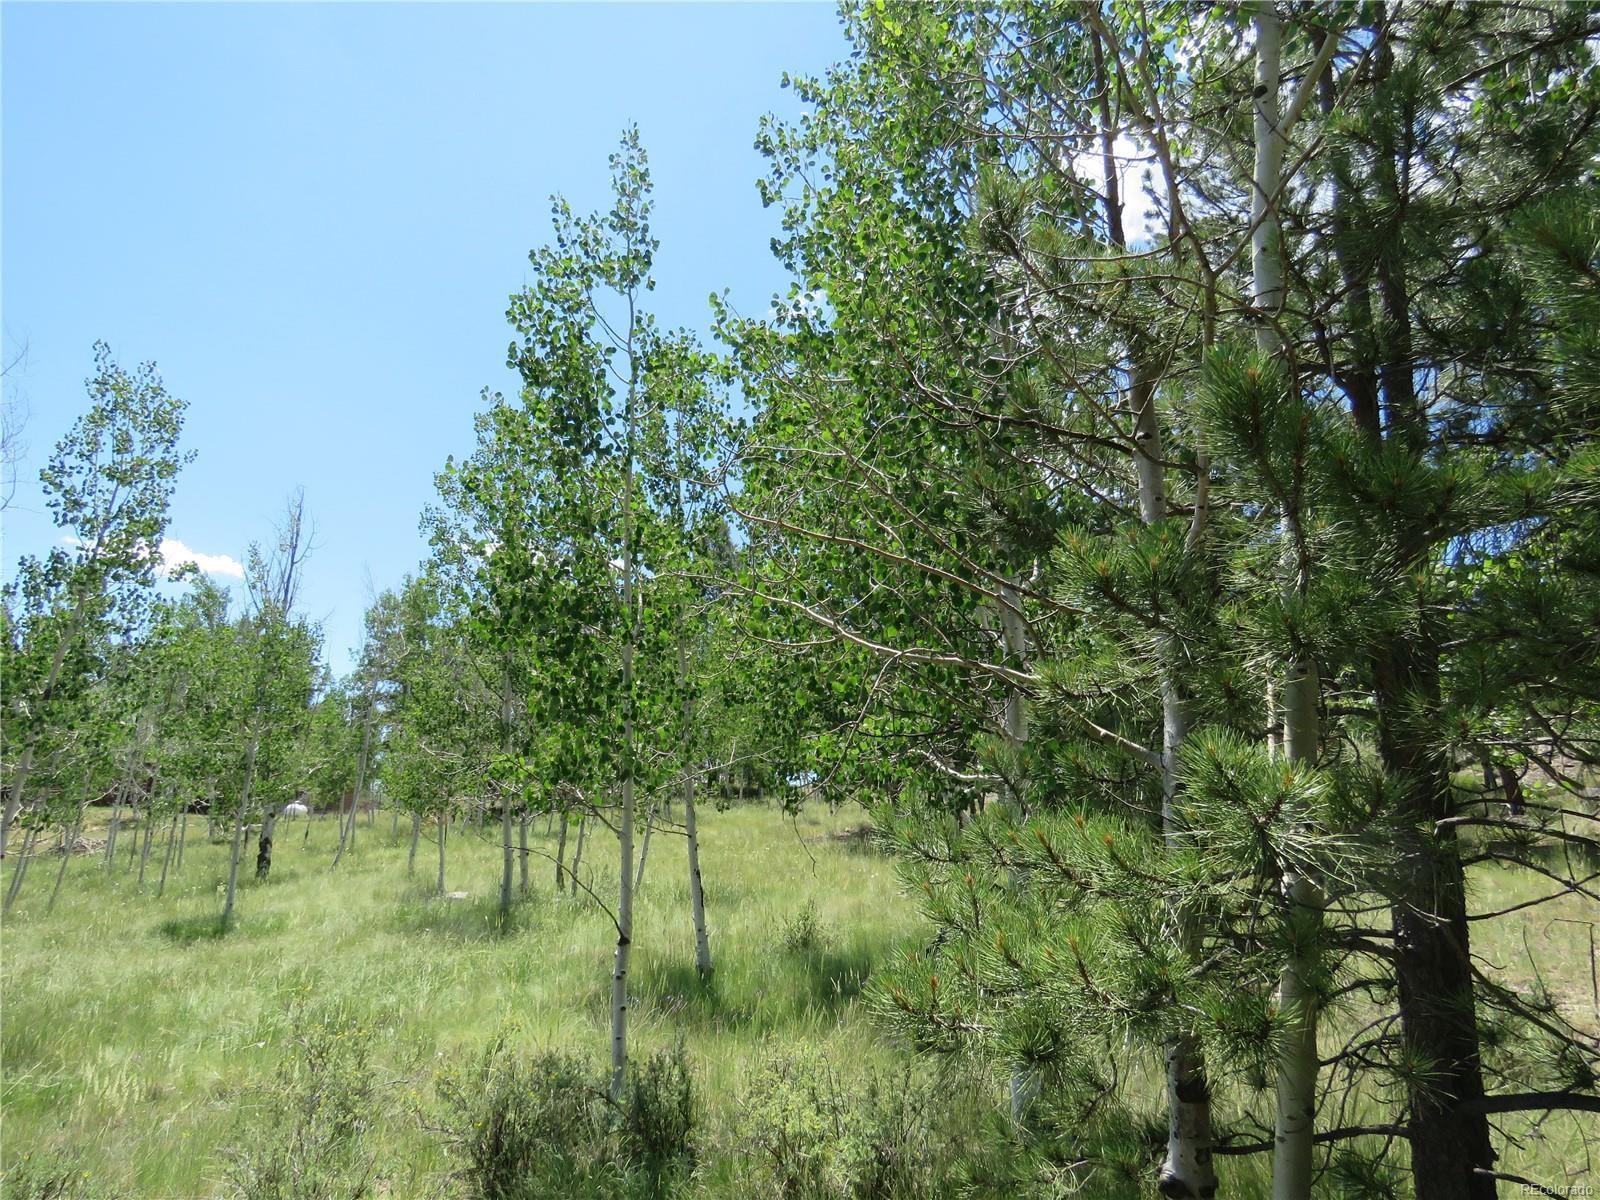 MLS# 8486542 - 30 - 43 Harness Trail, Florissant, CO 80816